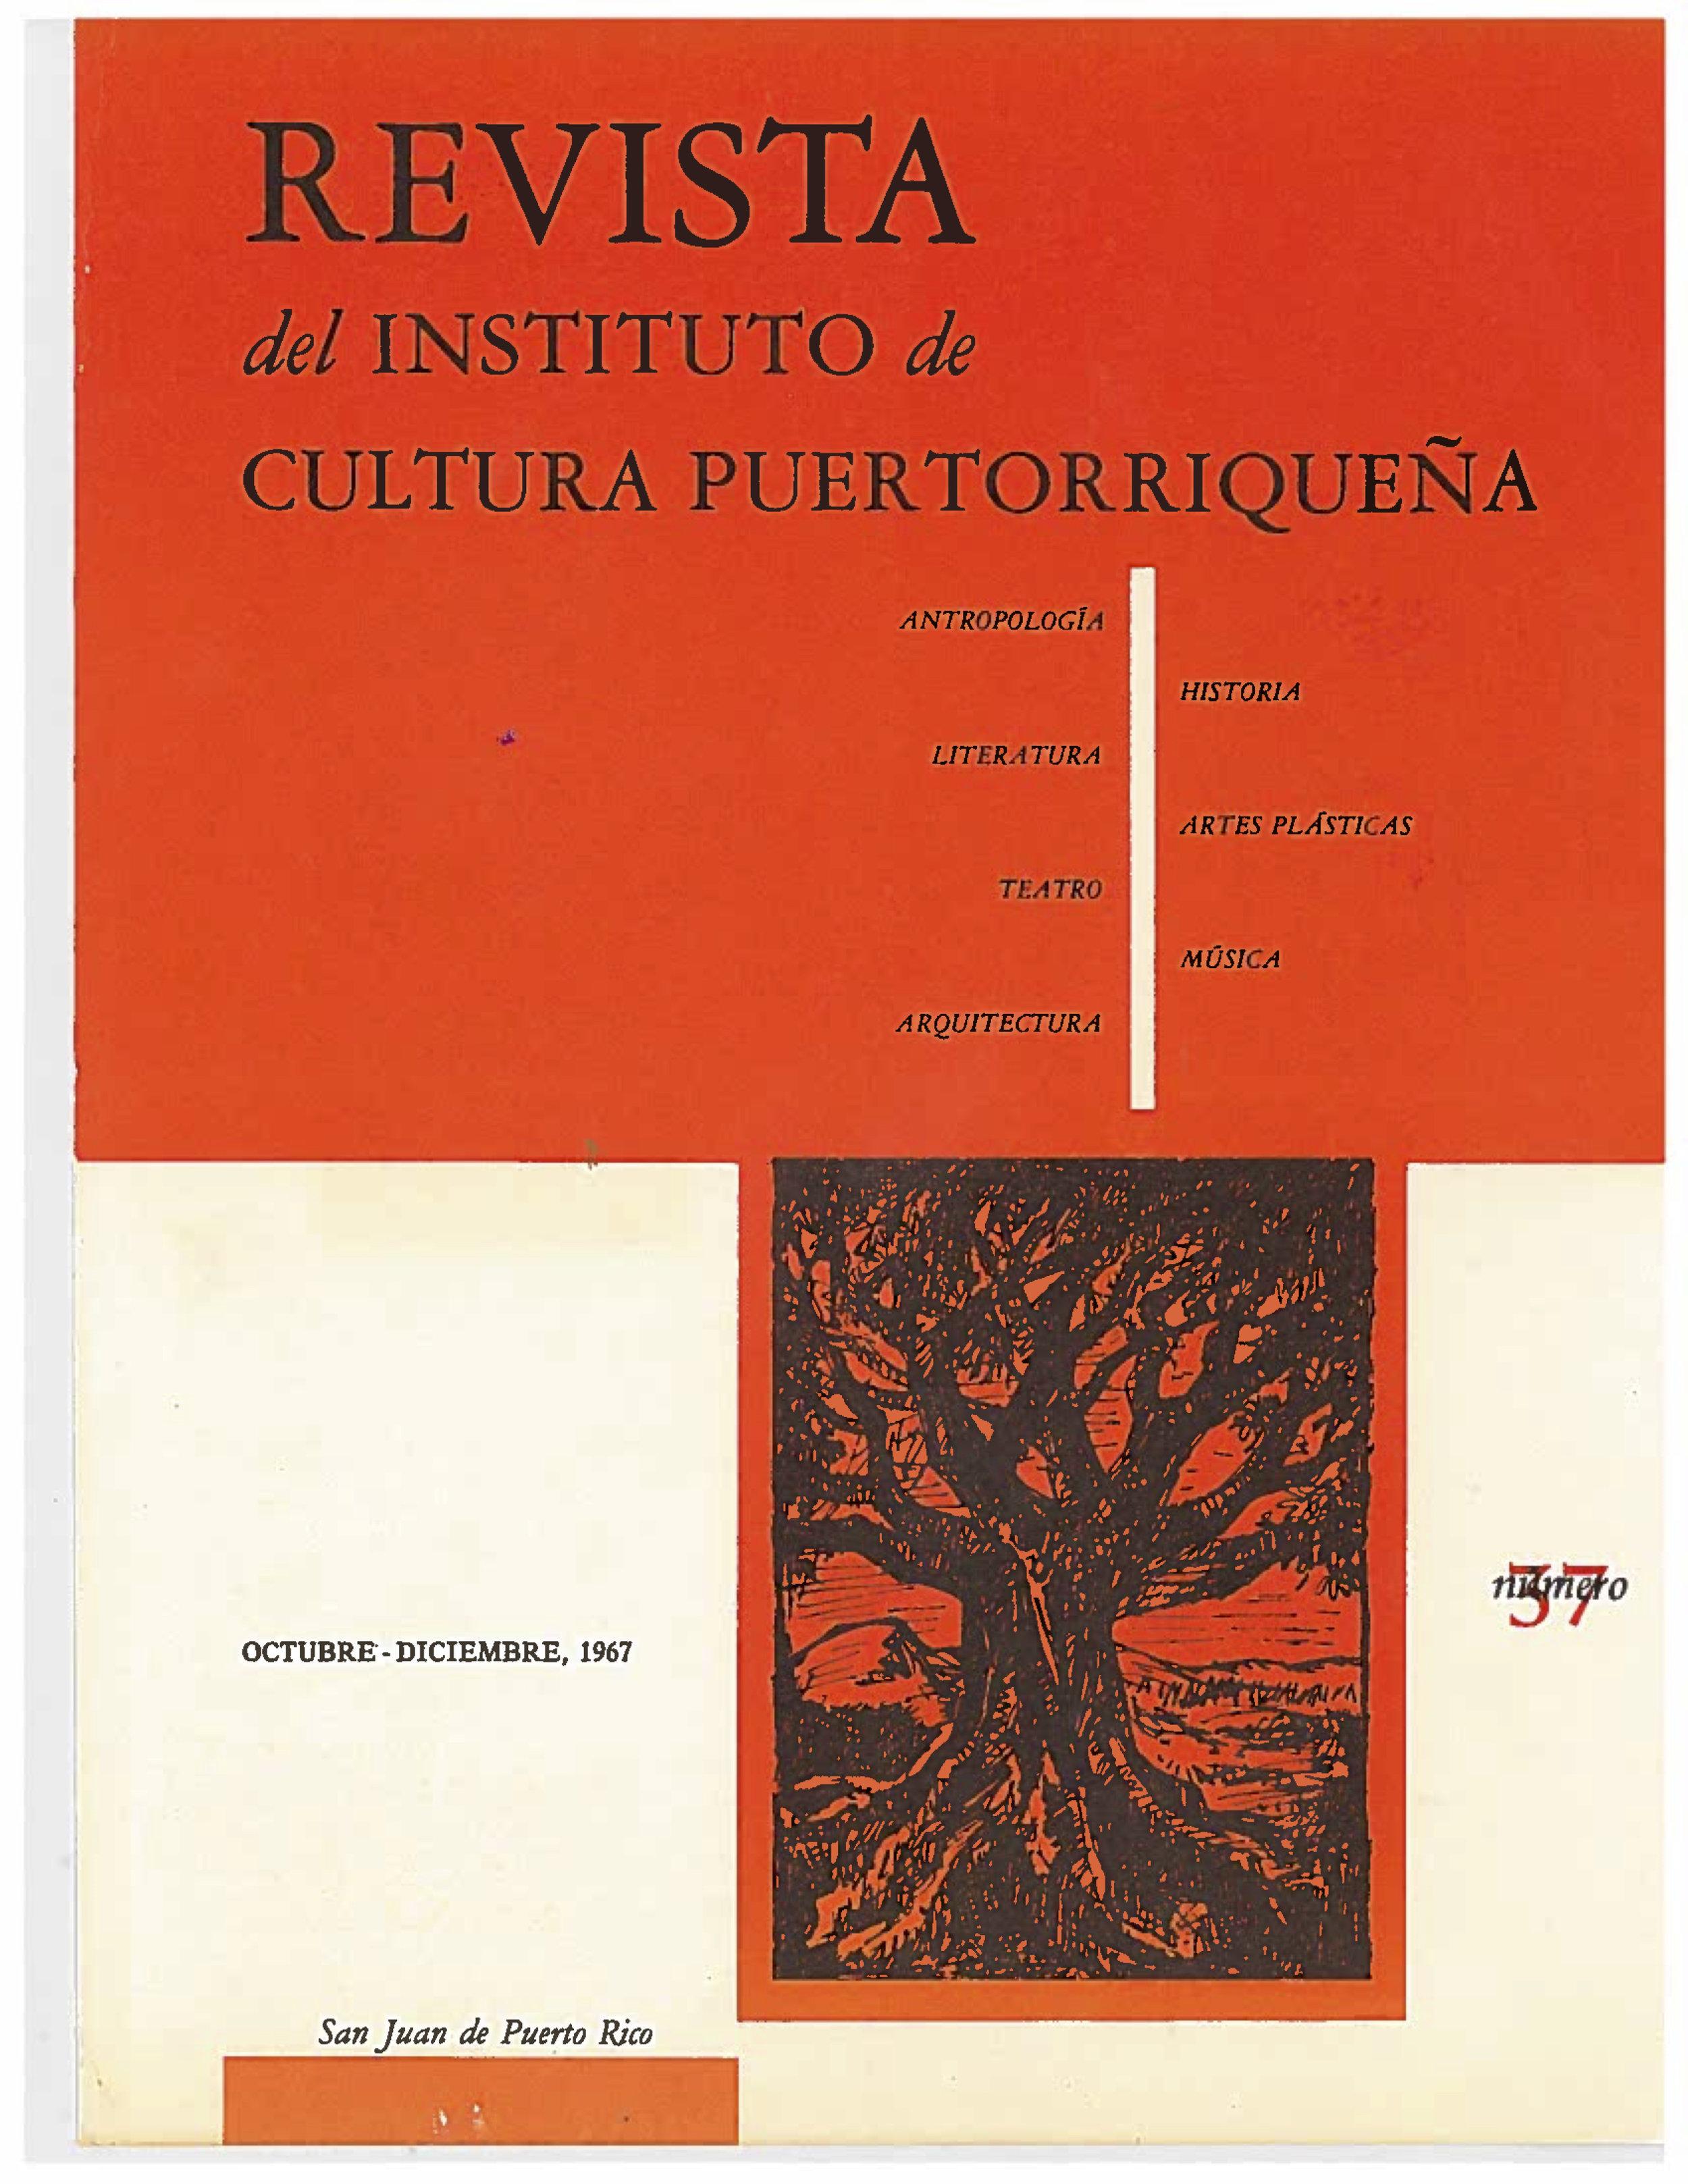 Número 37 / 1967